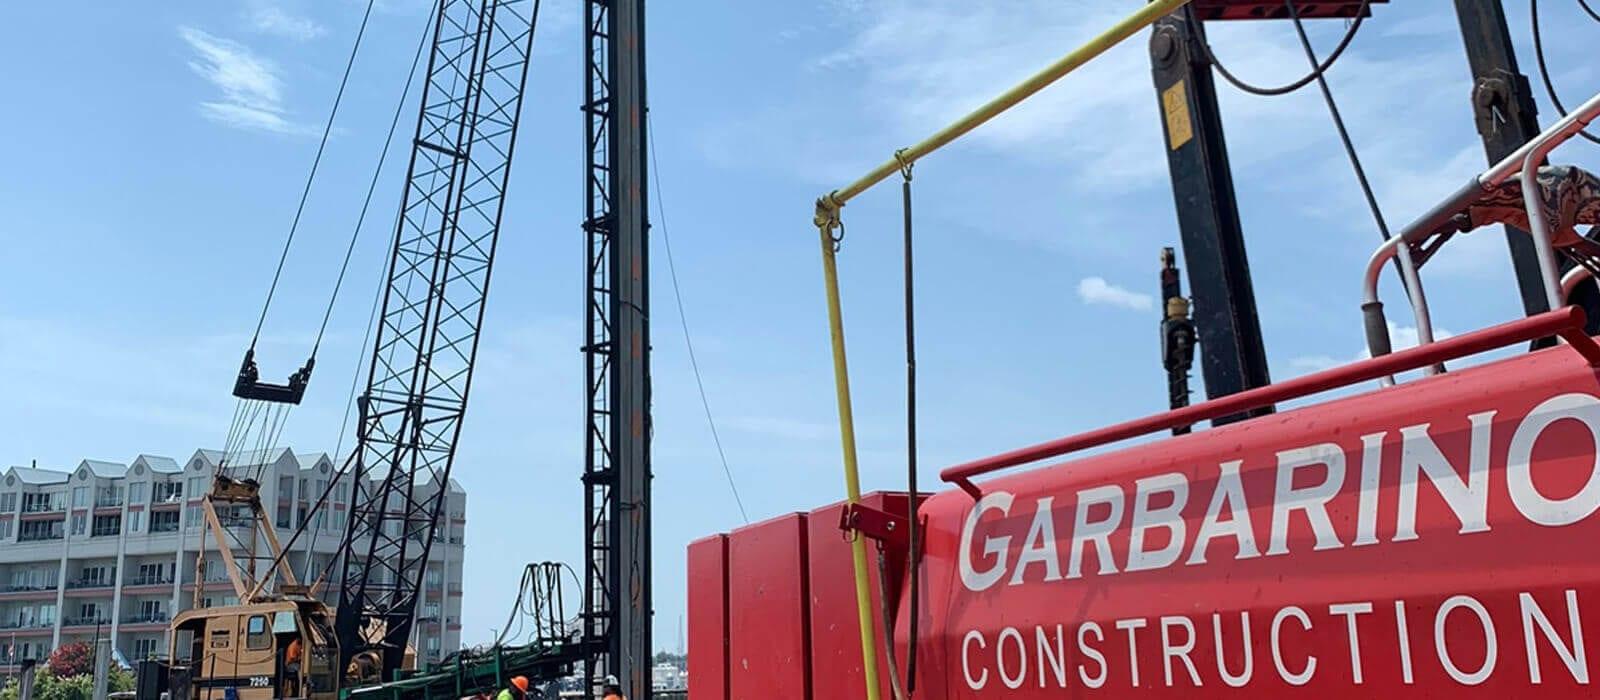 Garbarino-Construction-American-7260-Crane-1